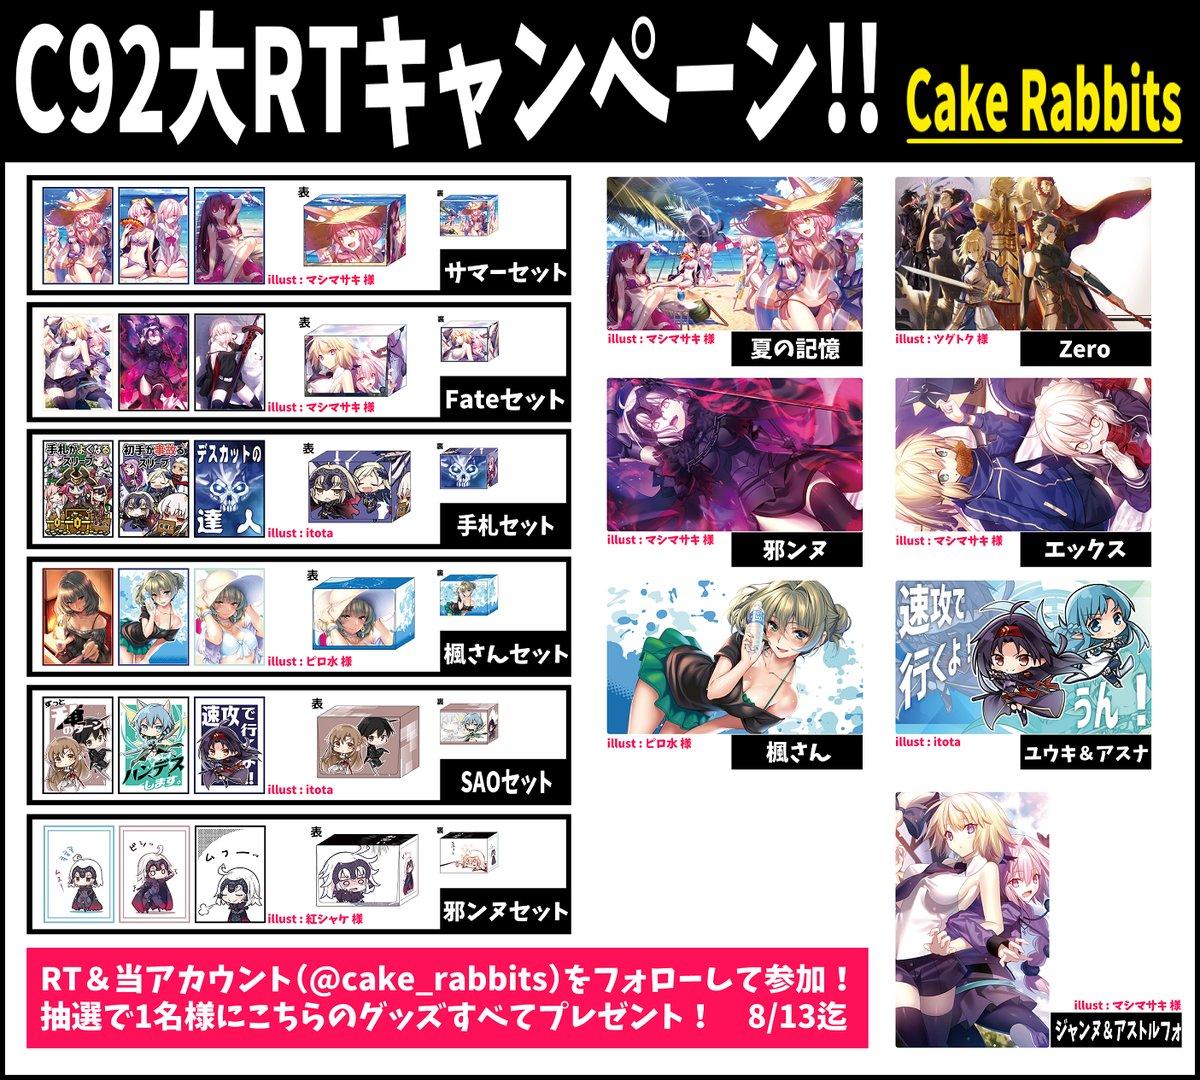 cake-rabbits-20170809-027.jpg